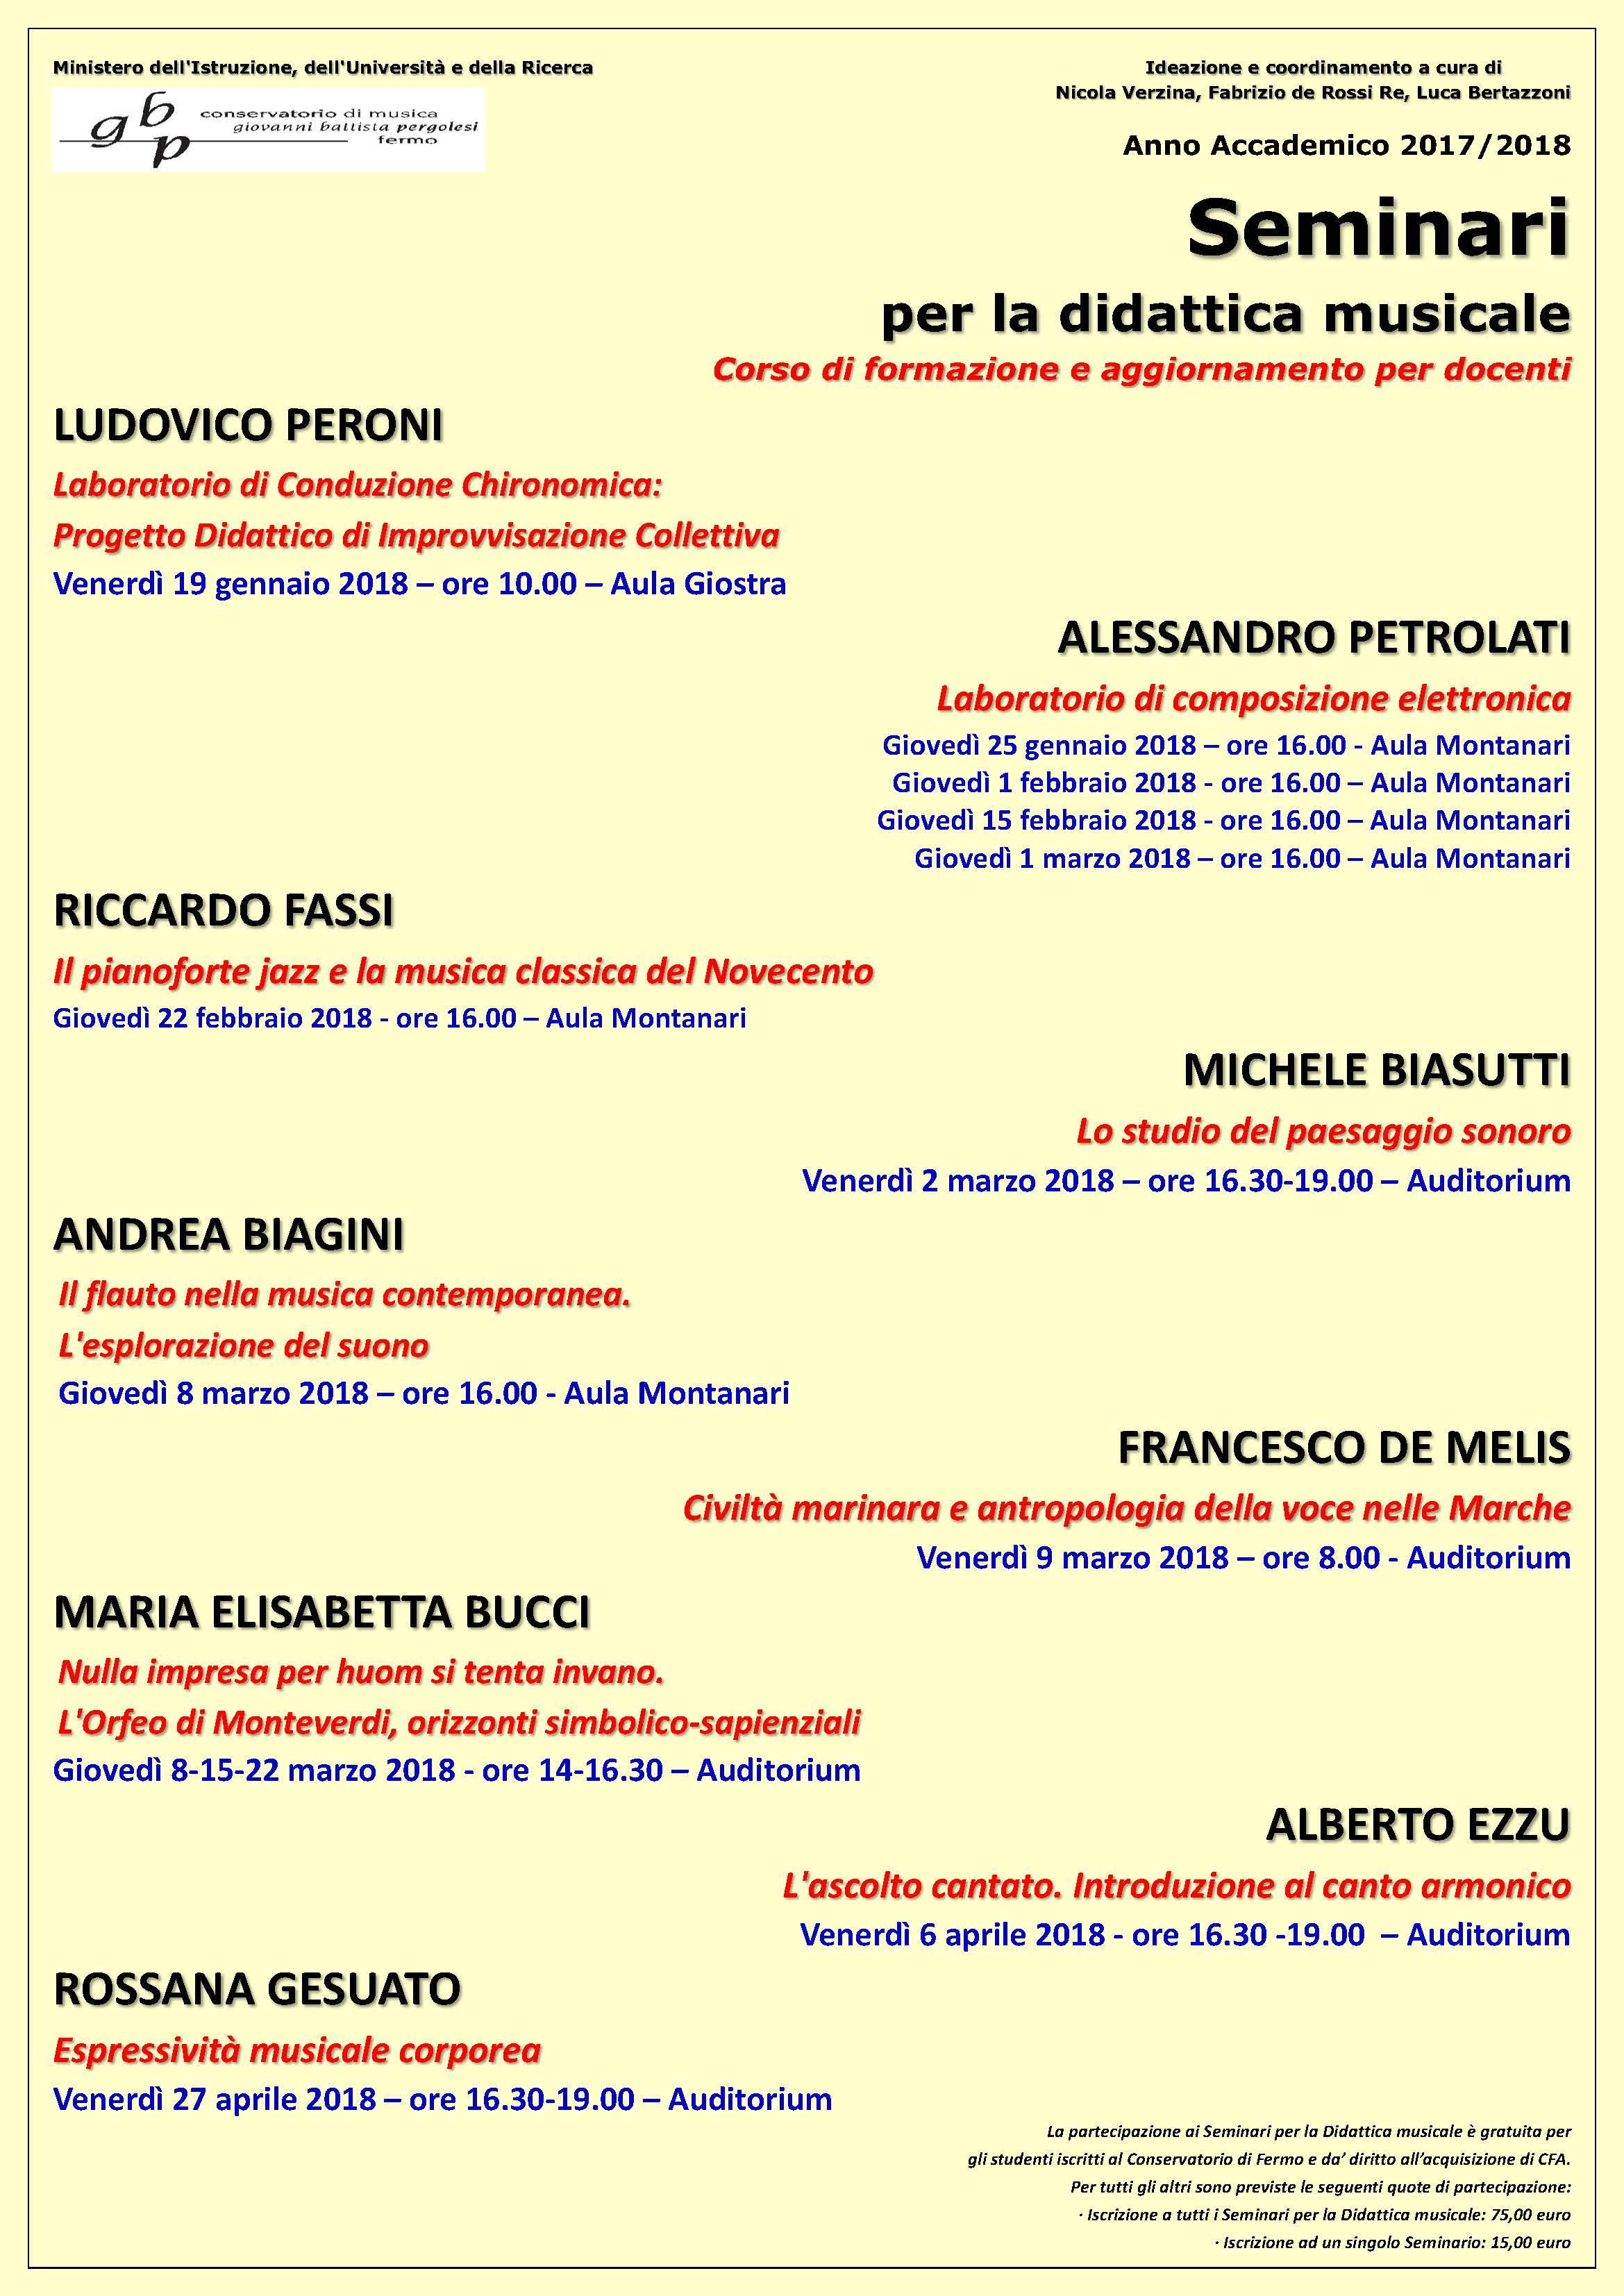 Locandina Seminari didattica 2017-18